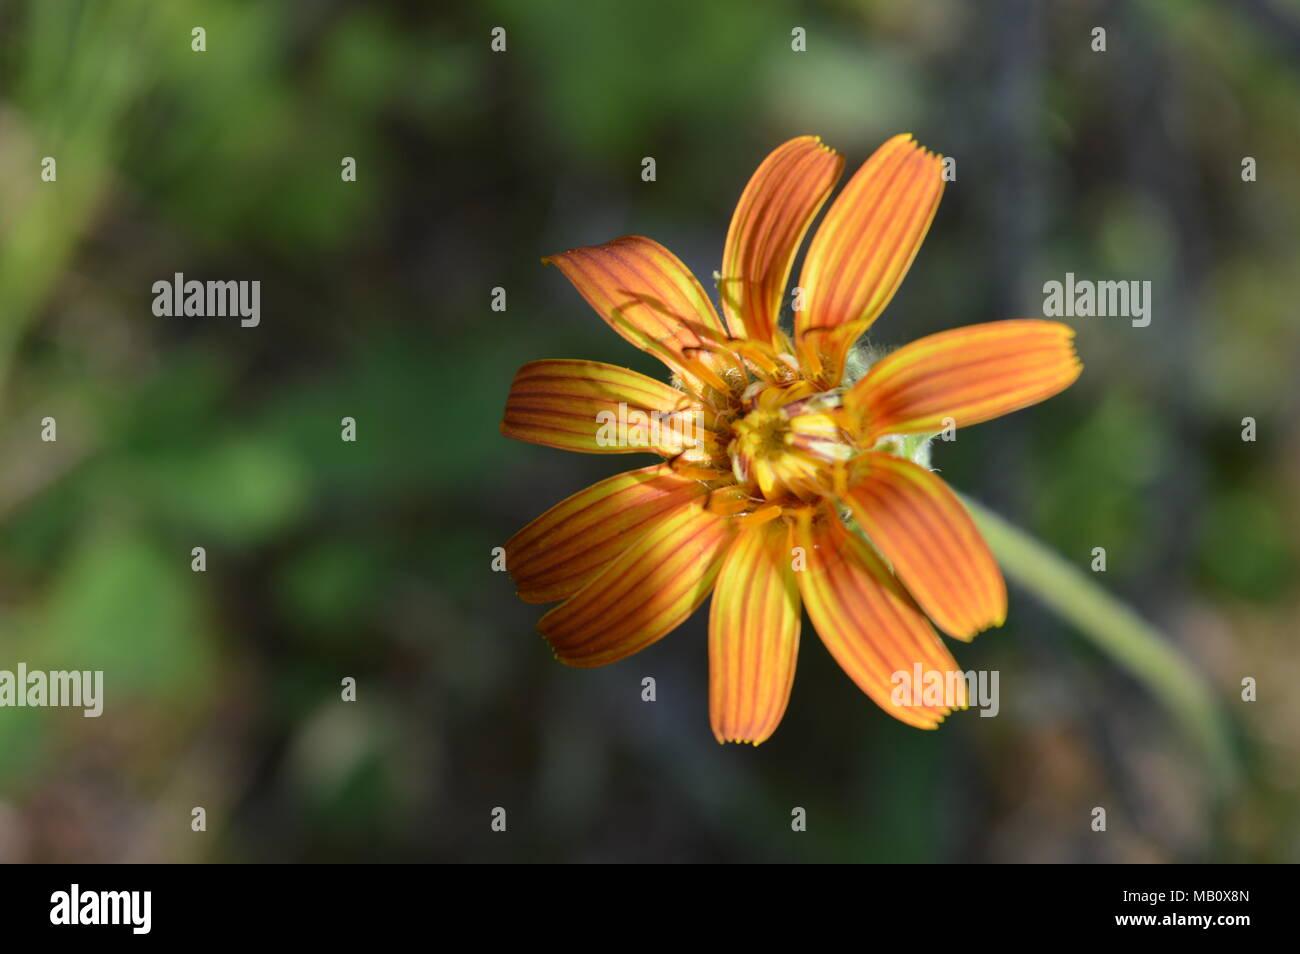 Pretty orange and yellow flower - Stock Image